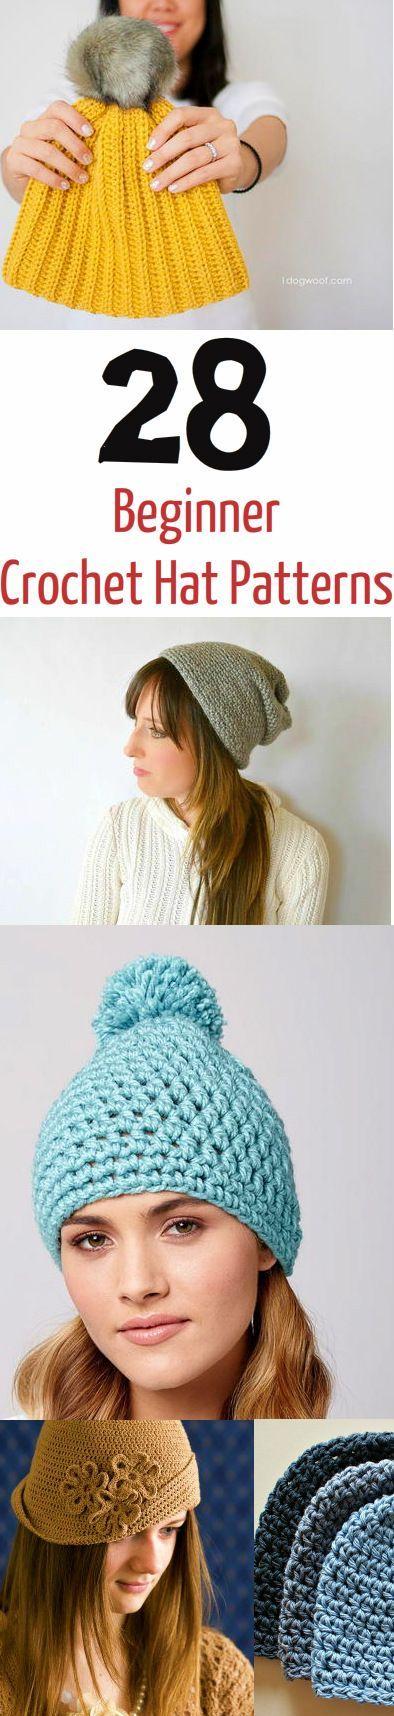 50 Beginner Crochet Hat Patterns Crochet Crochet Hats Crochet